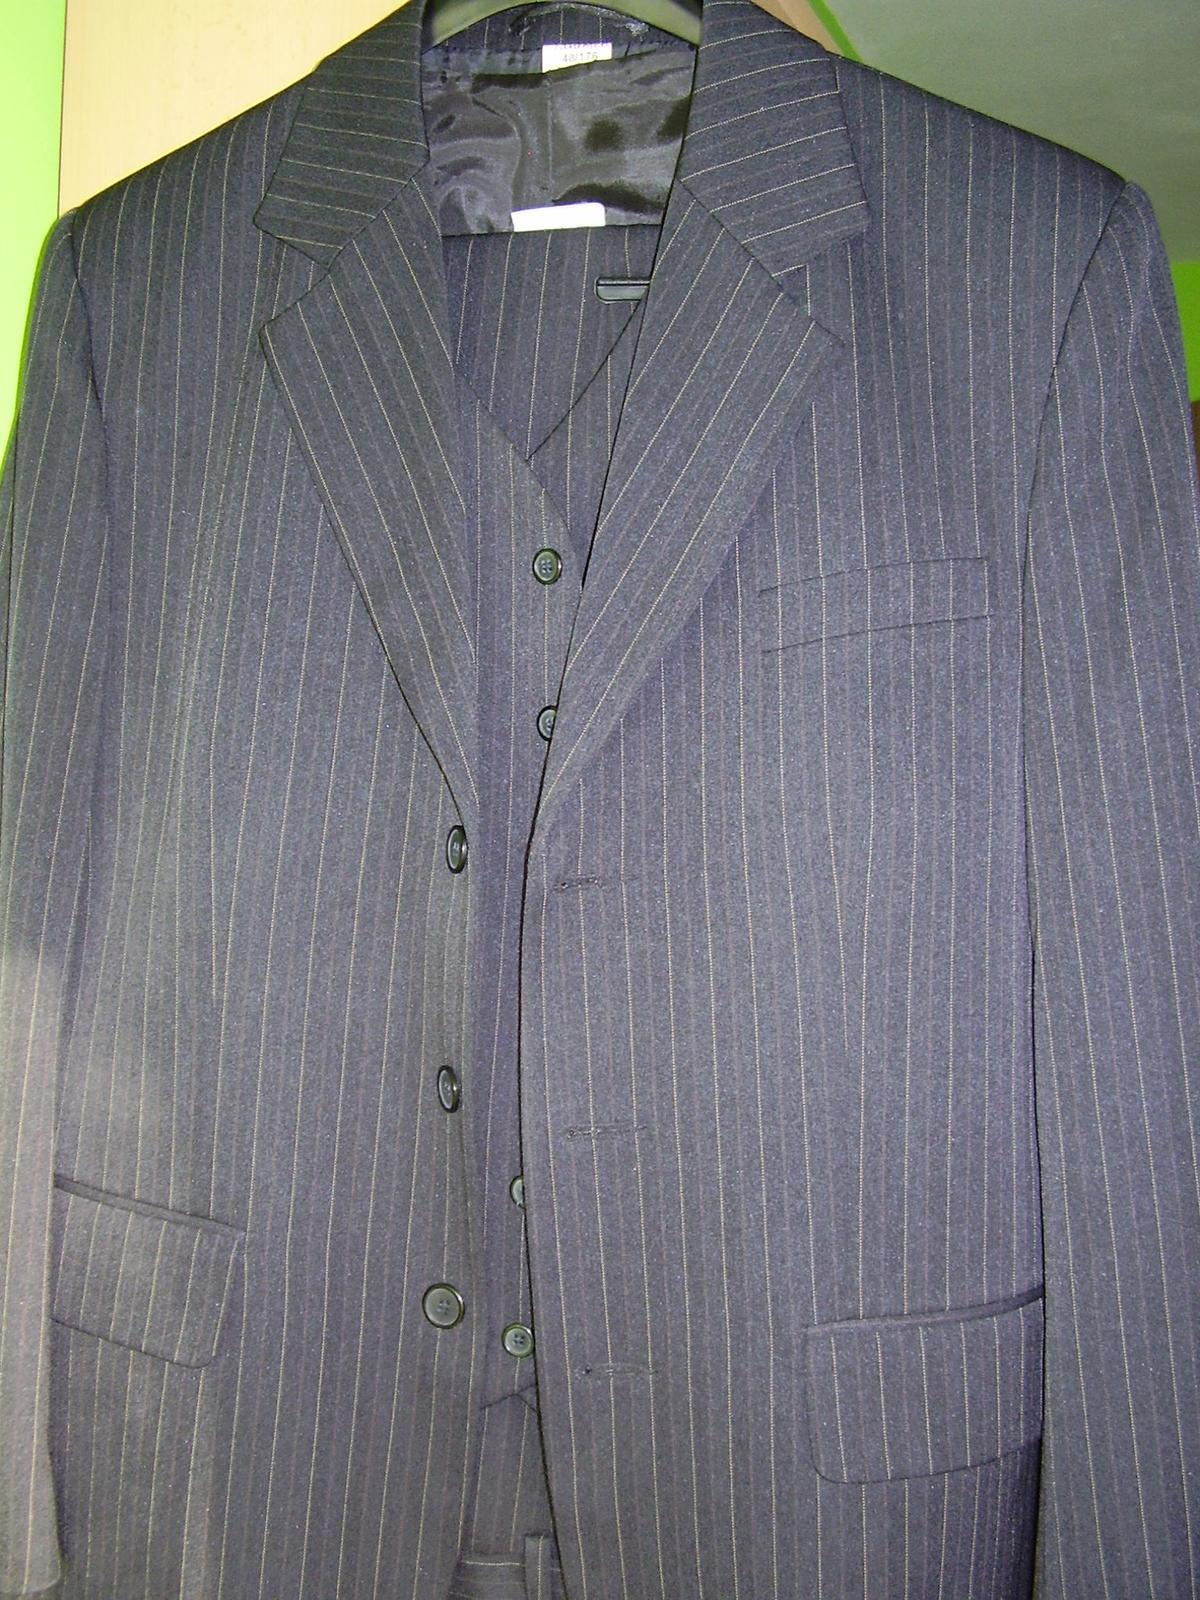 pánsky oblek  - Obrázok č. 1